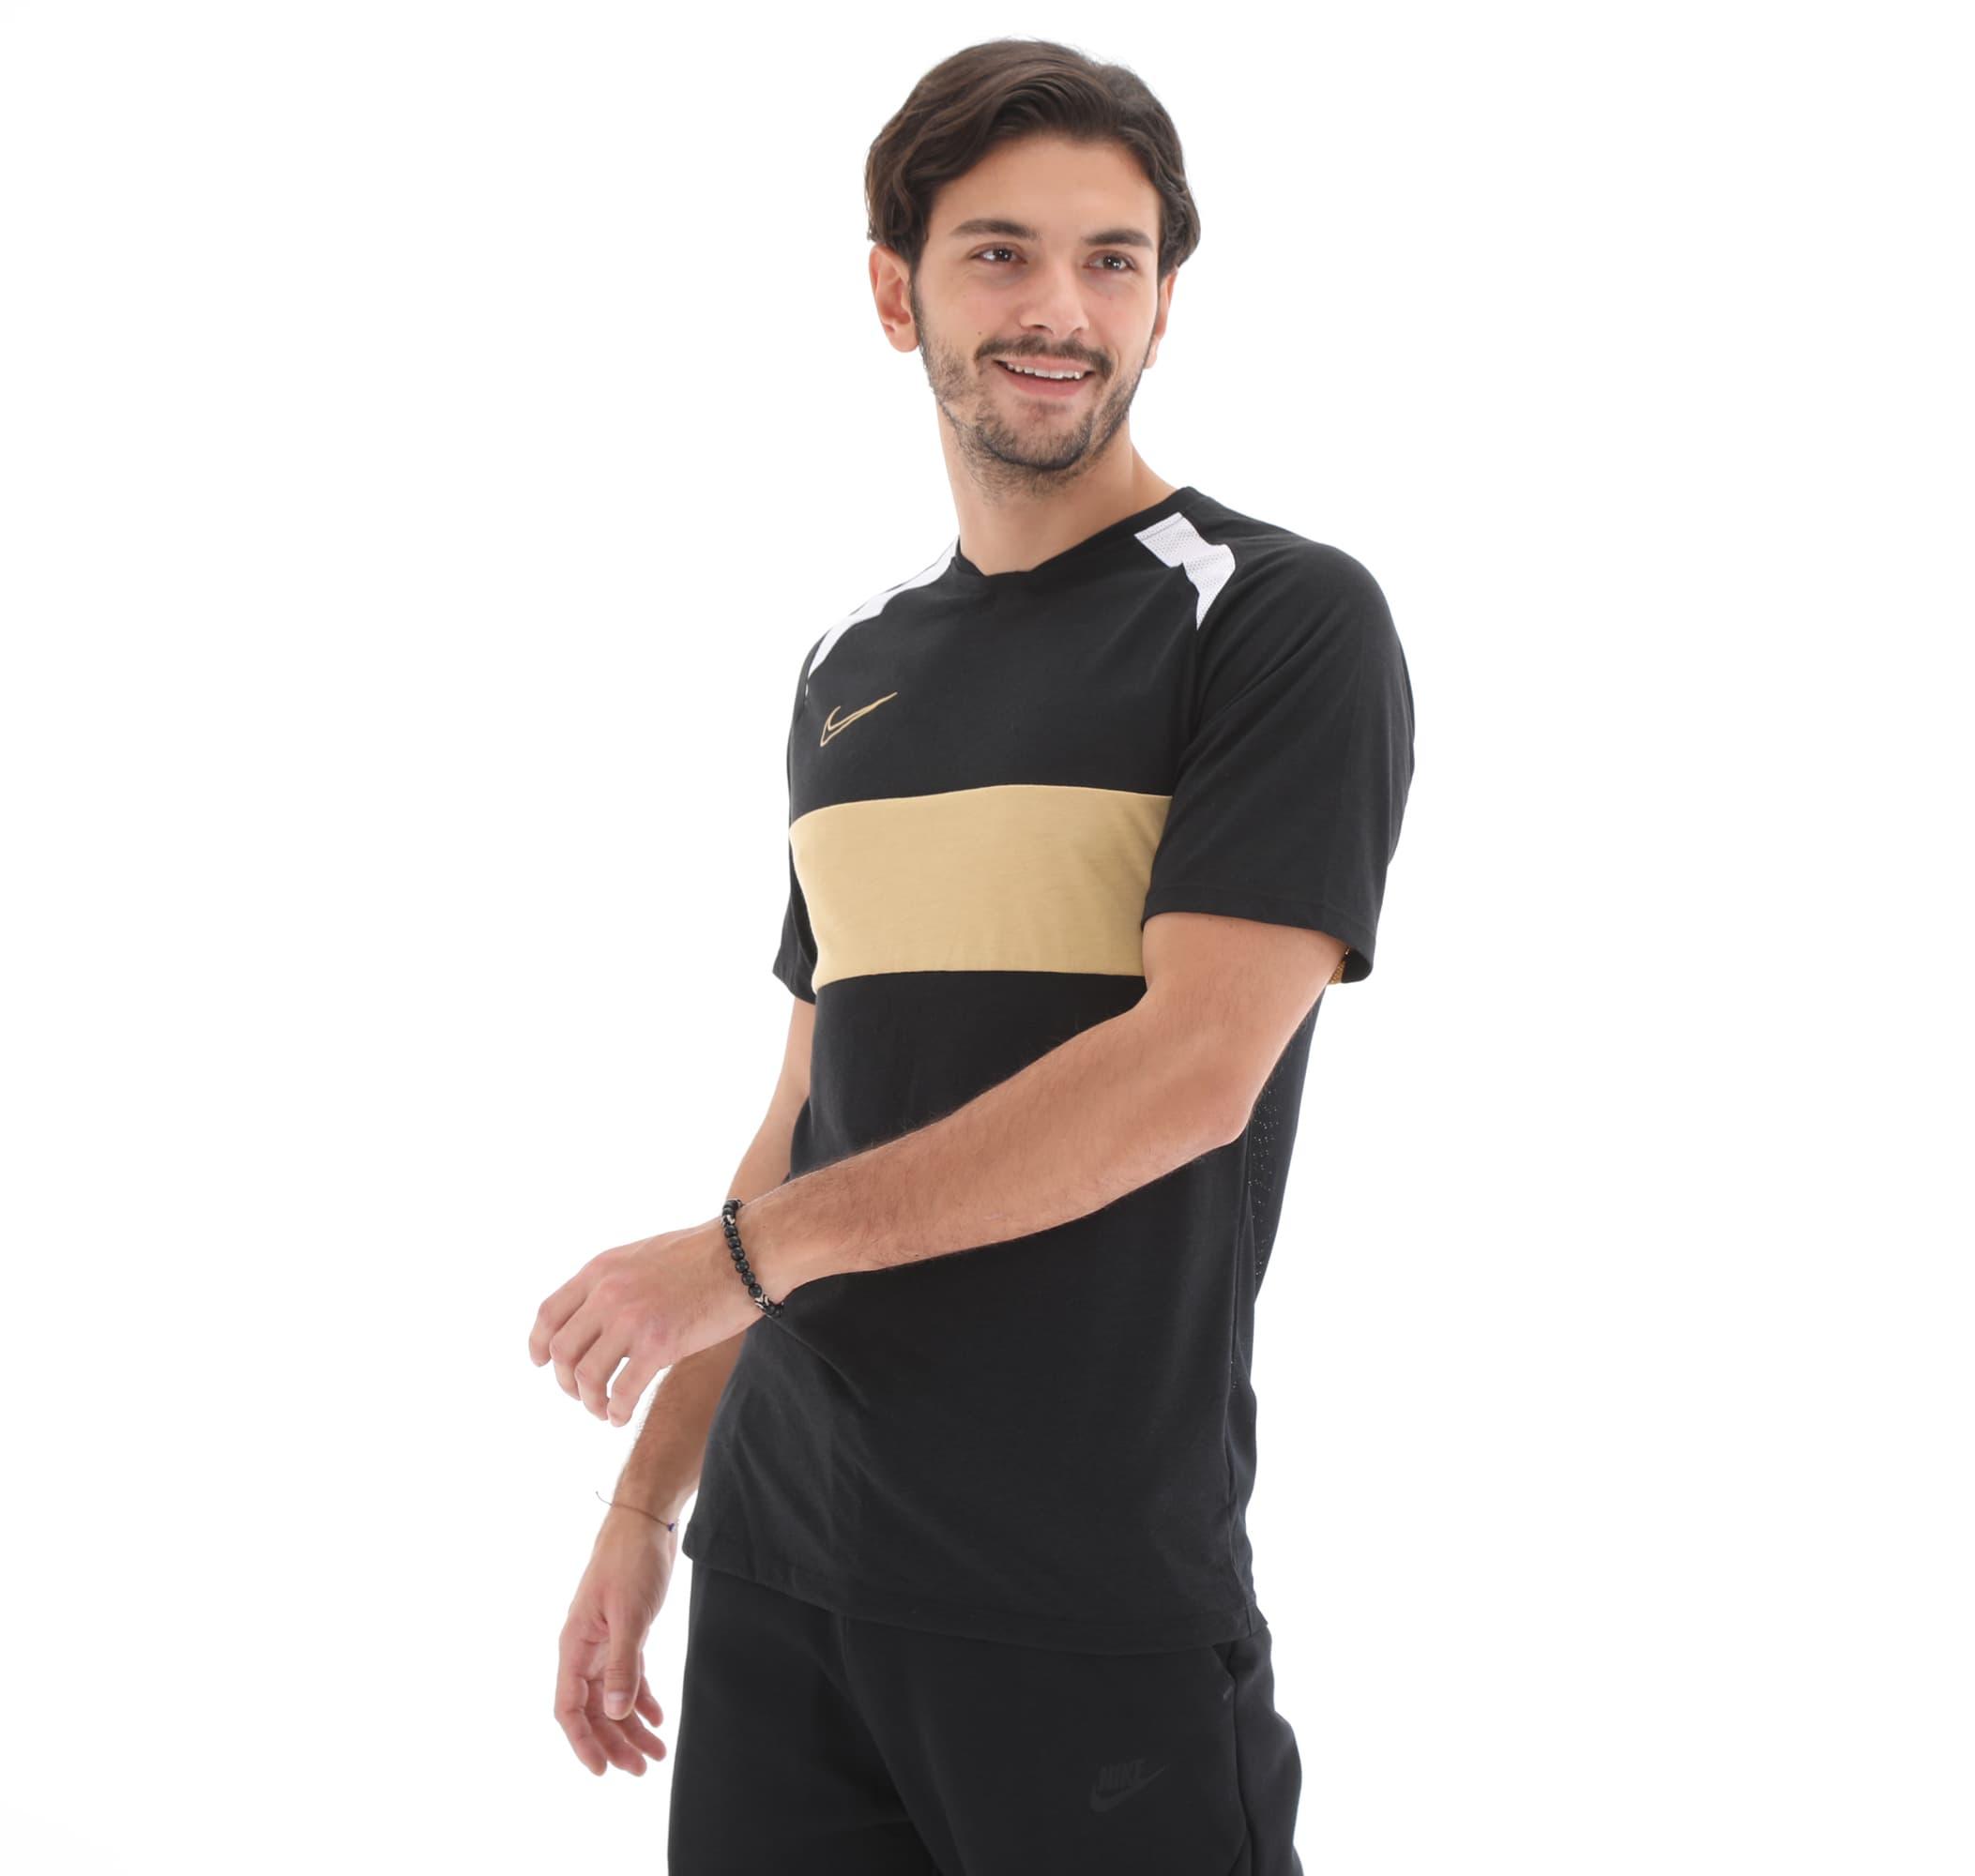 Dri-Fit Academy Erkek Siyah Futbol Tişört  (BQ7352-010)